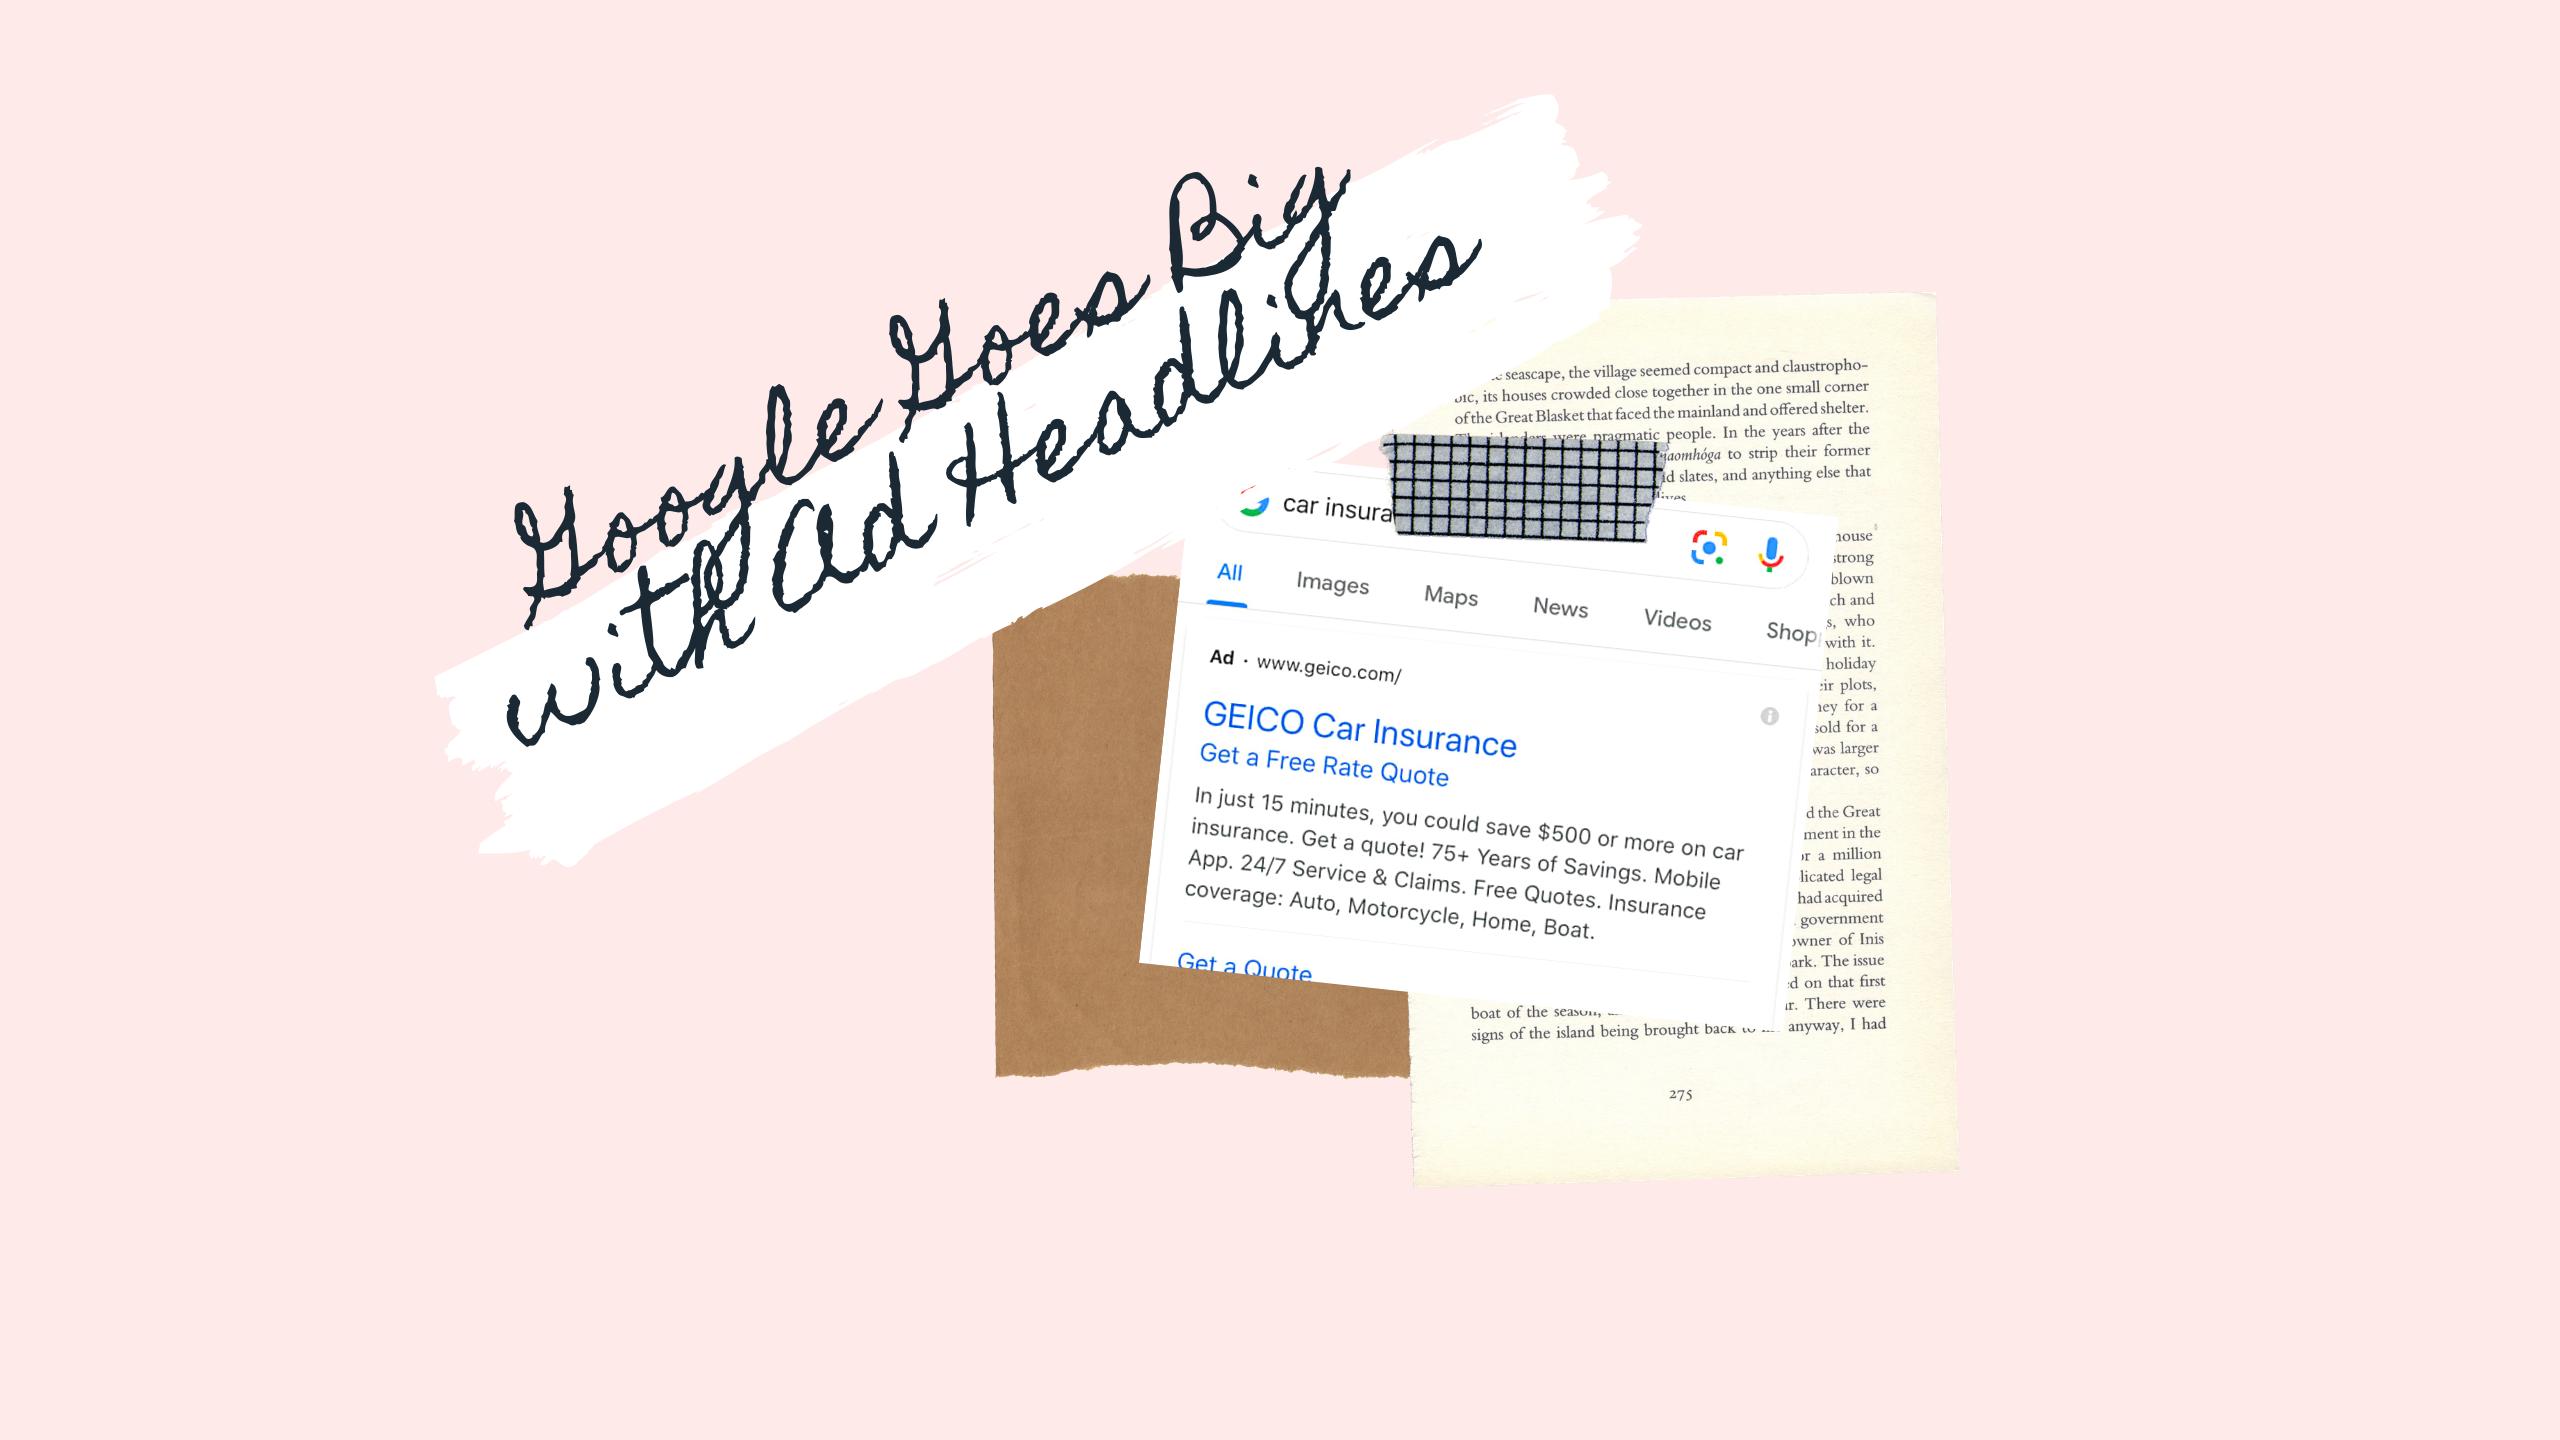 Google Goes Big with Ad Headlines